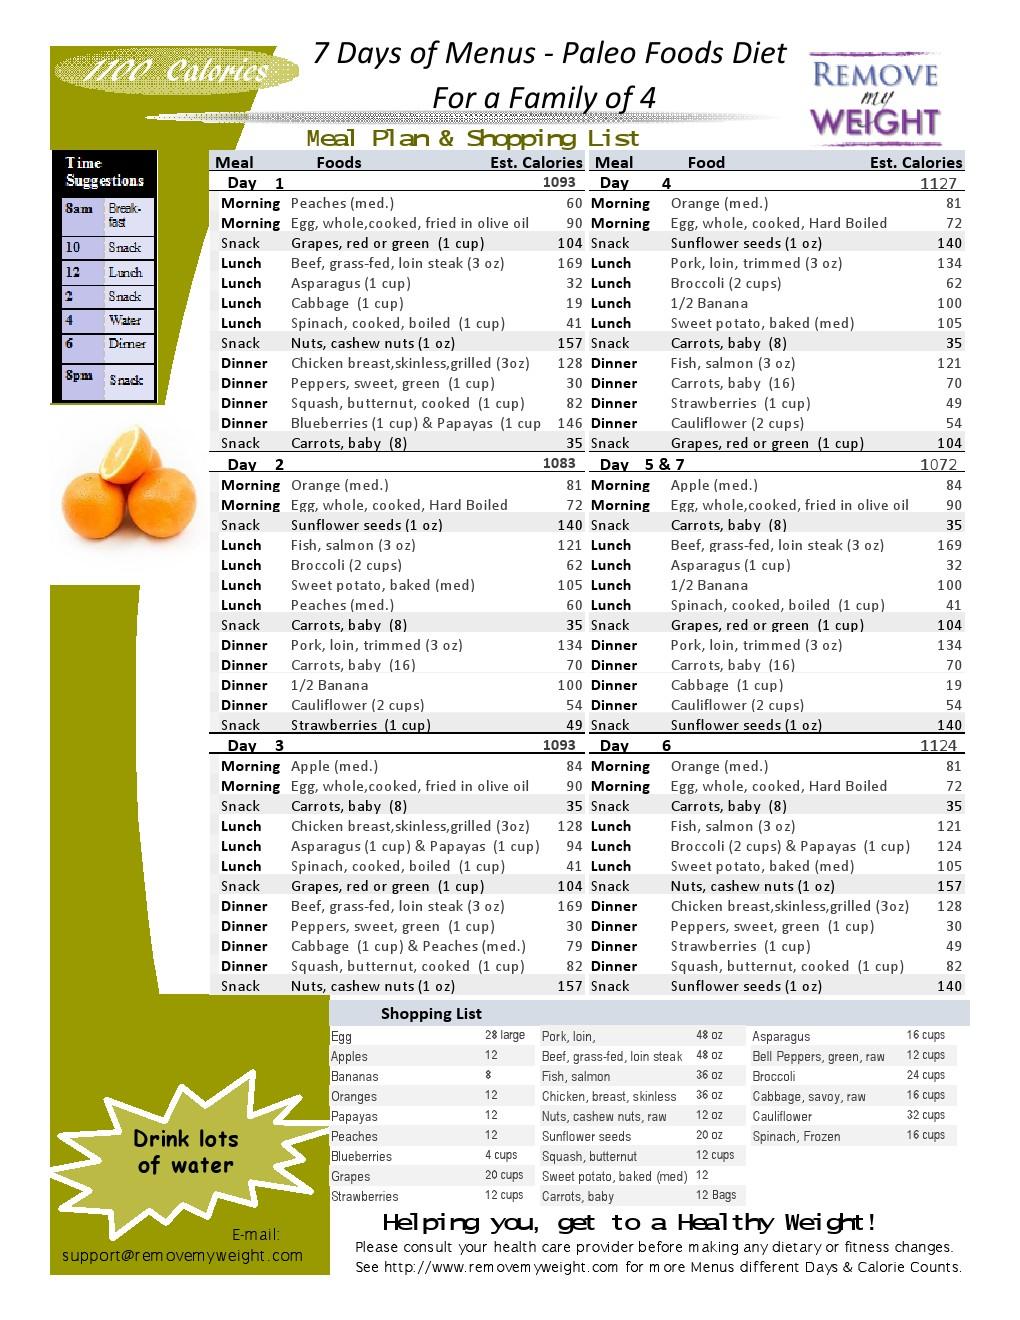 FREE 1000 Calorie - 7 Day Dukan Diet + Shopping List ...